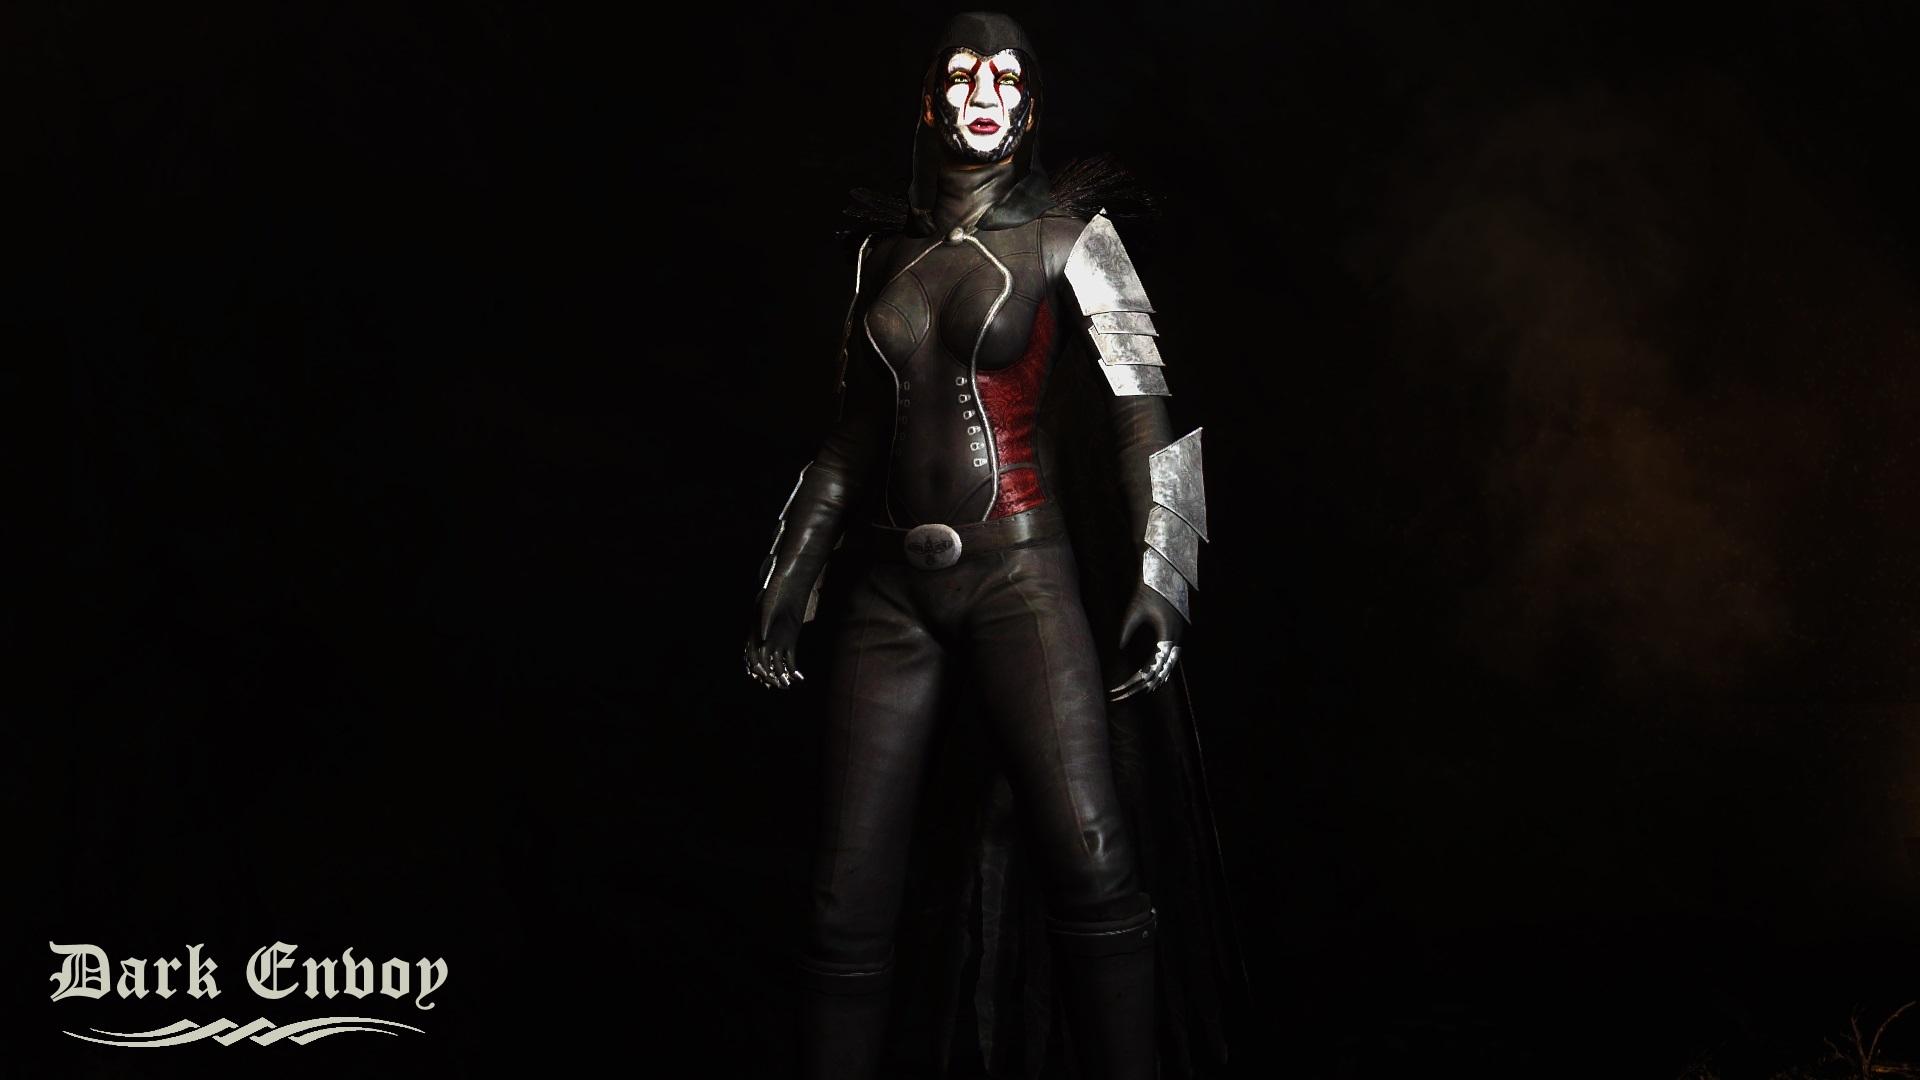 Dark_Envoy_L.jpg